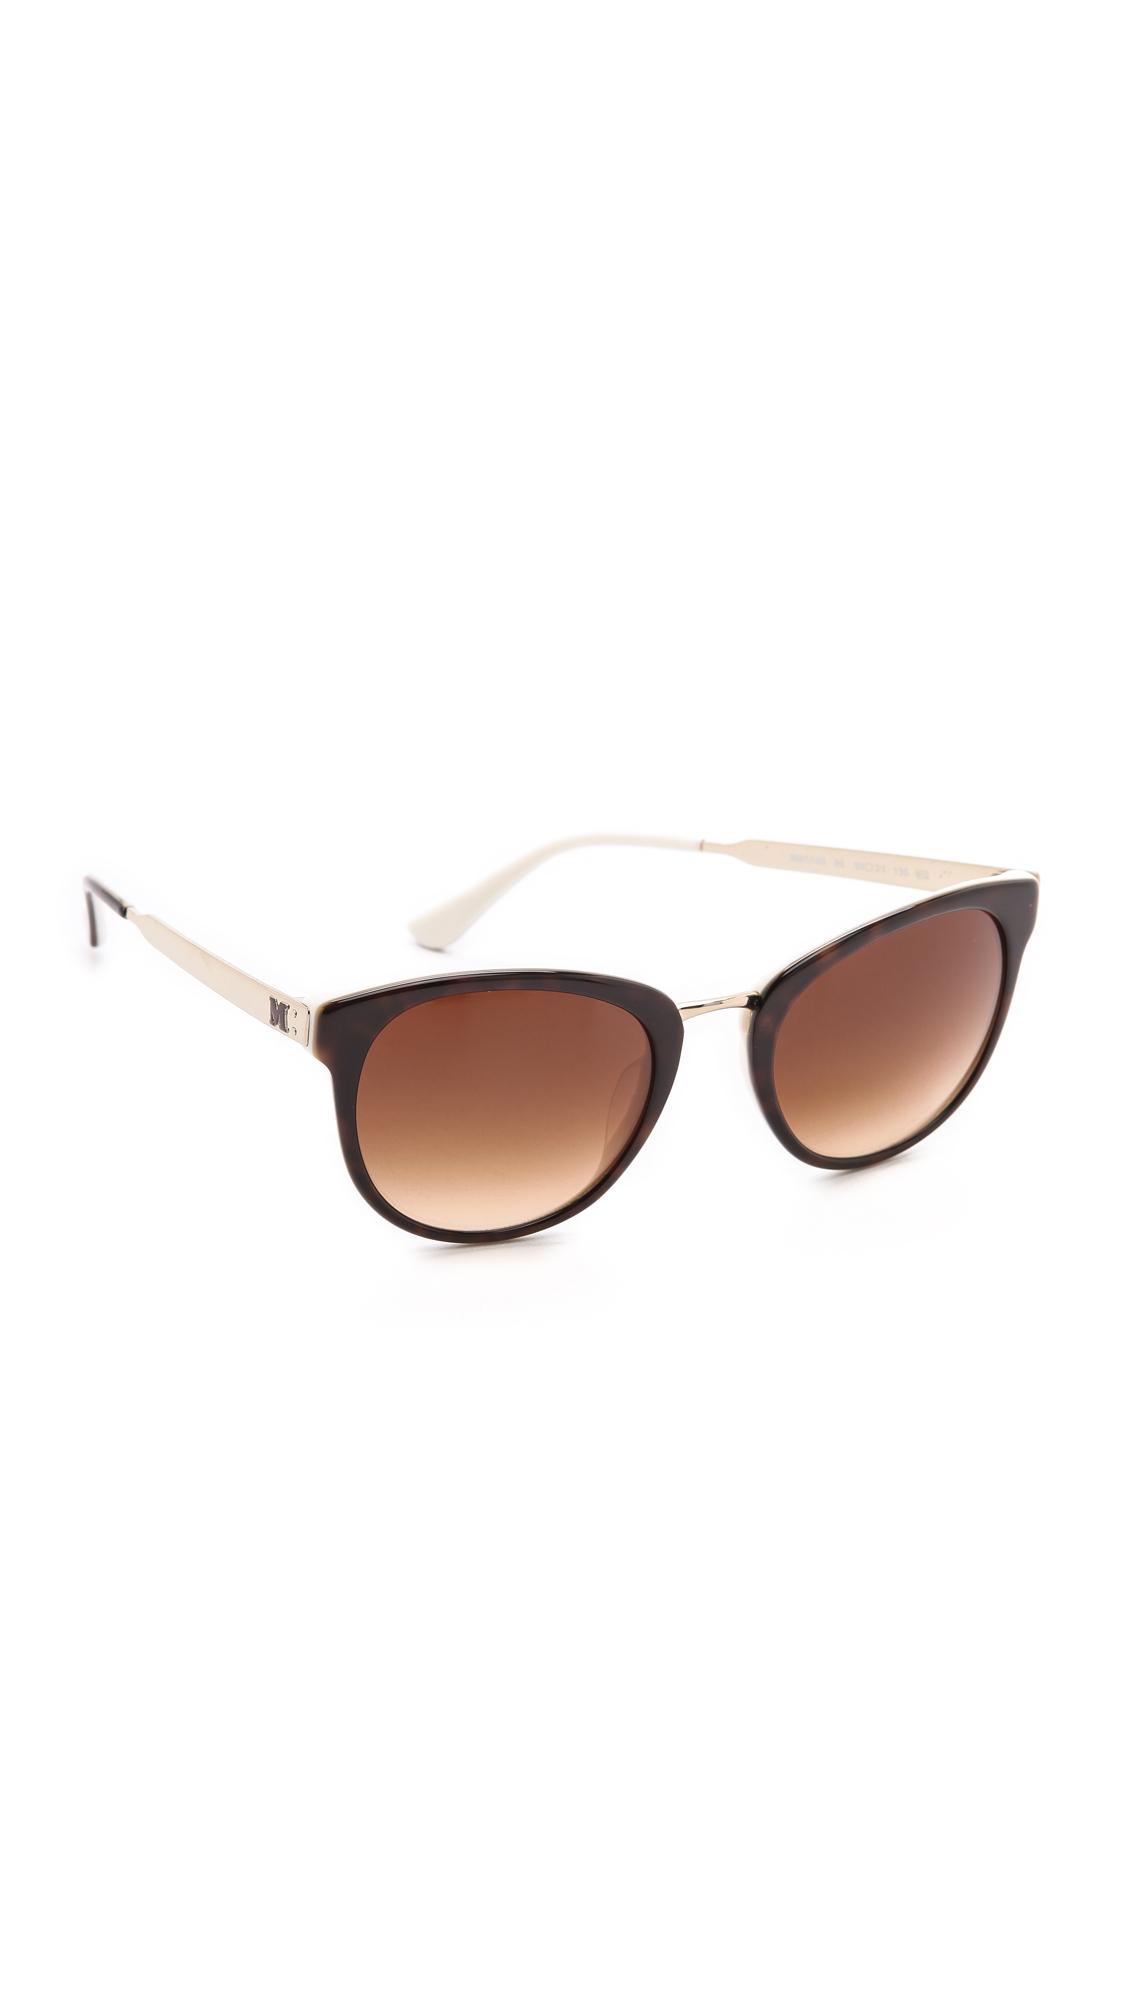 missoni sunglasses t8t0  Gallery